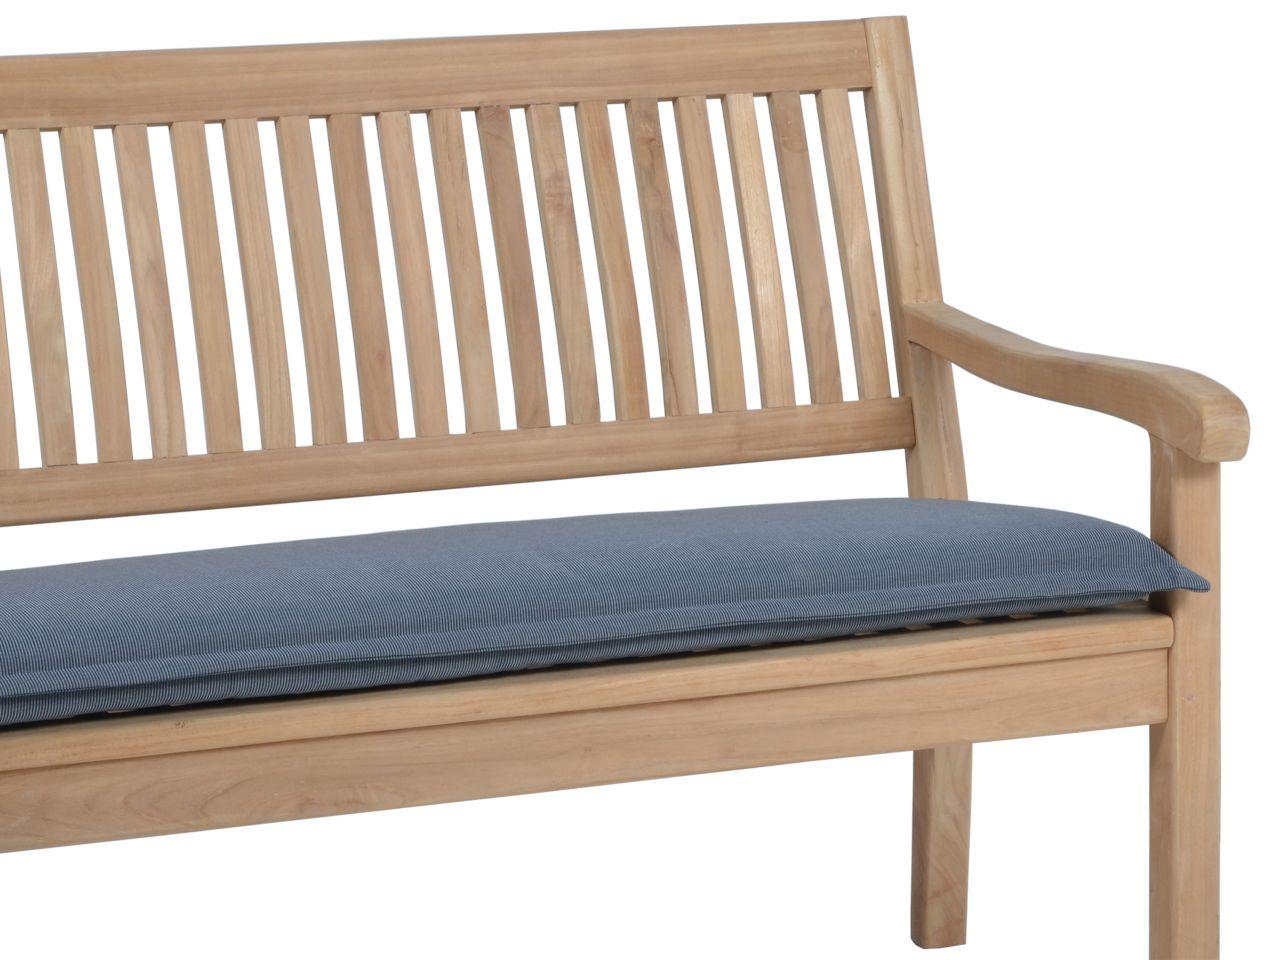 Bankauflage Malibu 3-Sitzer 140cm, Farbe: grey